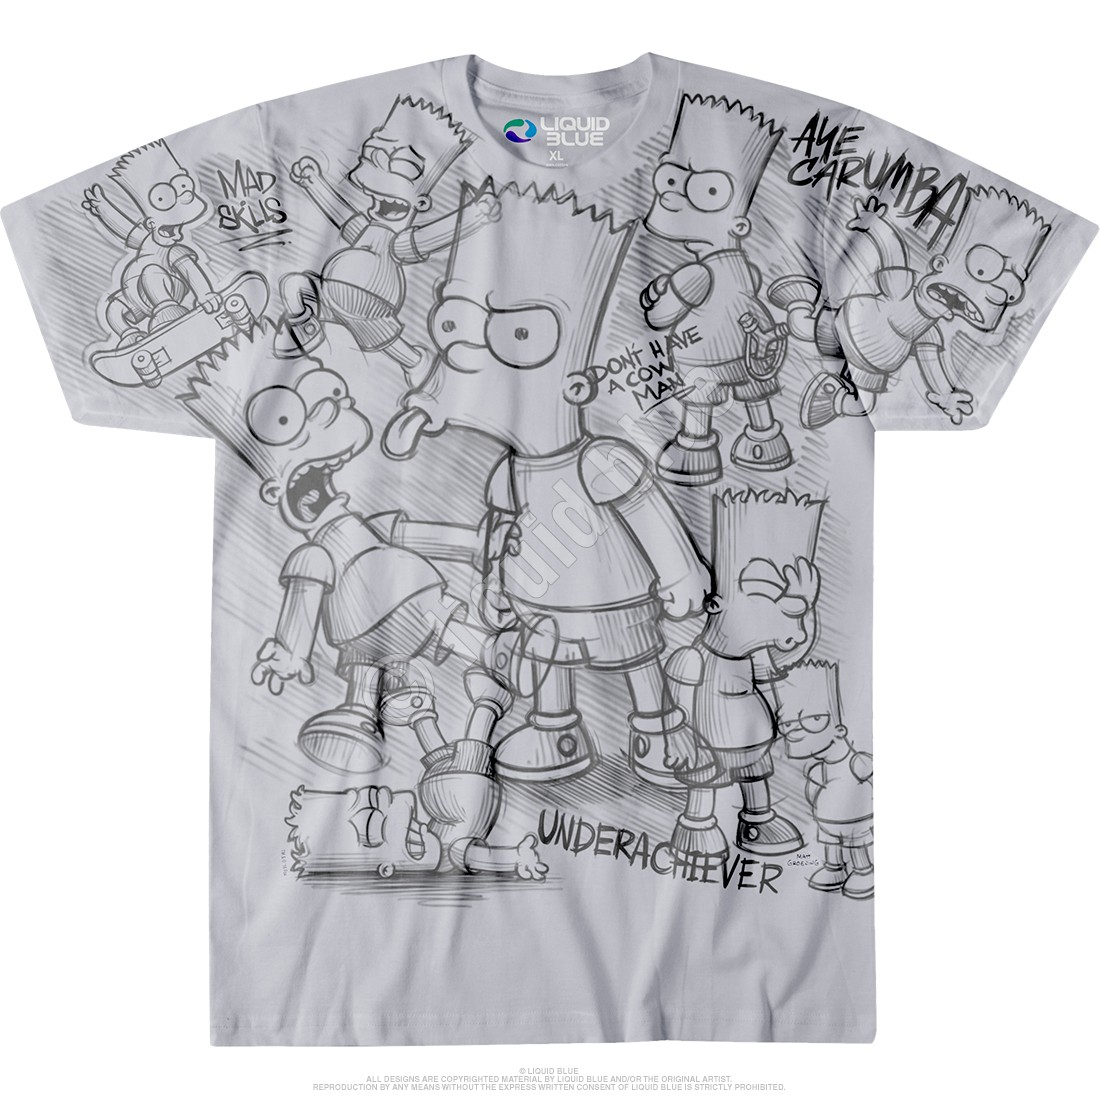 e60c70cb917 The Simpsons Bart Sketch Grey T-Shirt Liquid Blue - clothingmonster ...